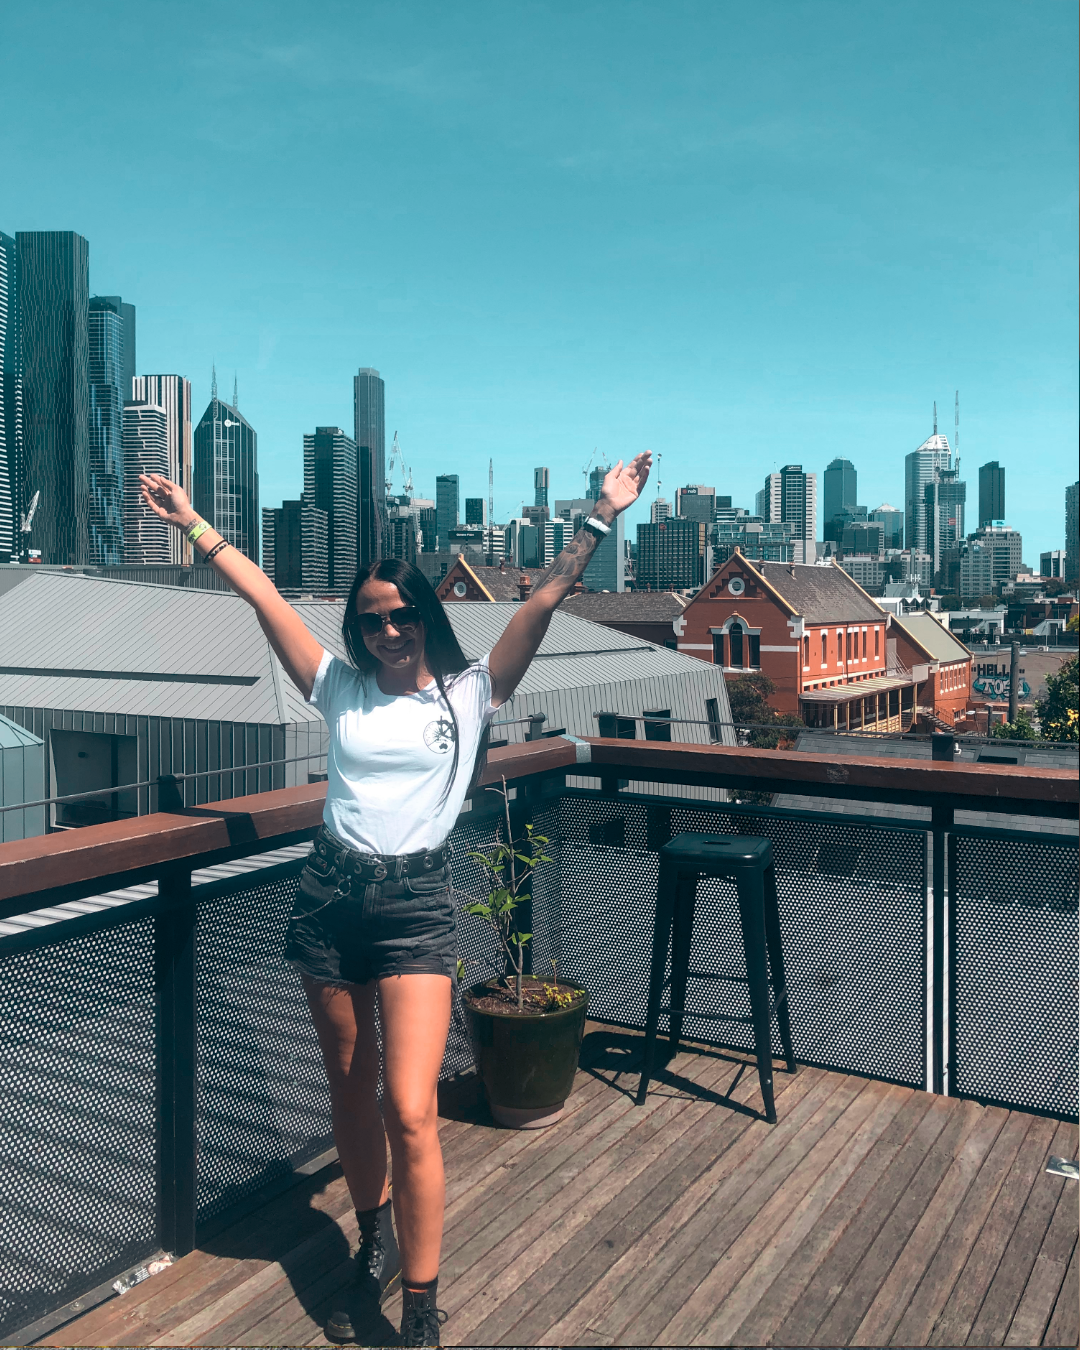 Rooftop of YHA hostel in Melbourne